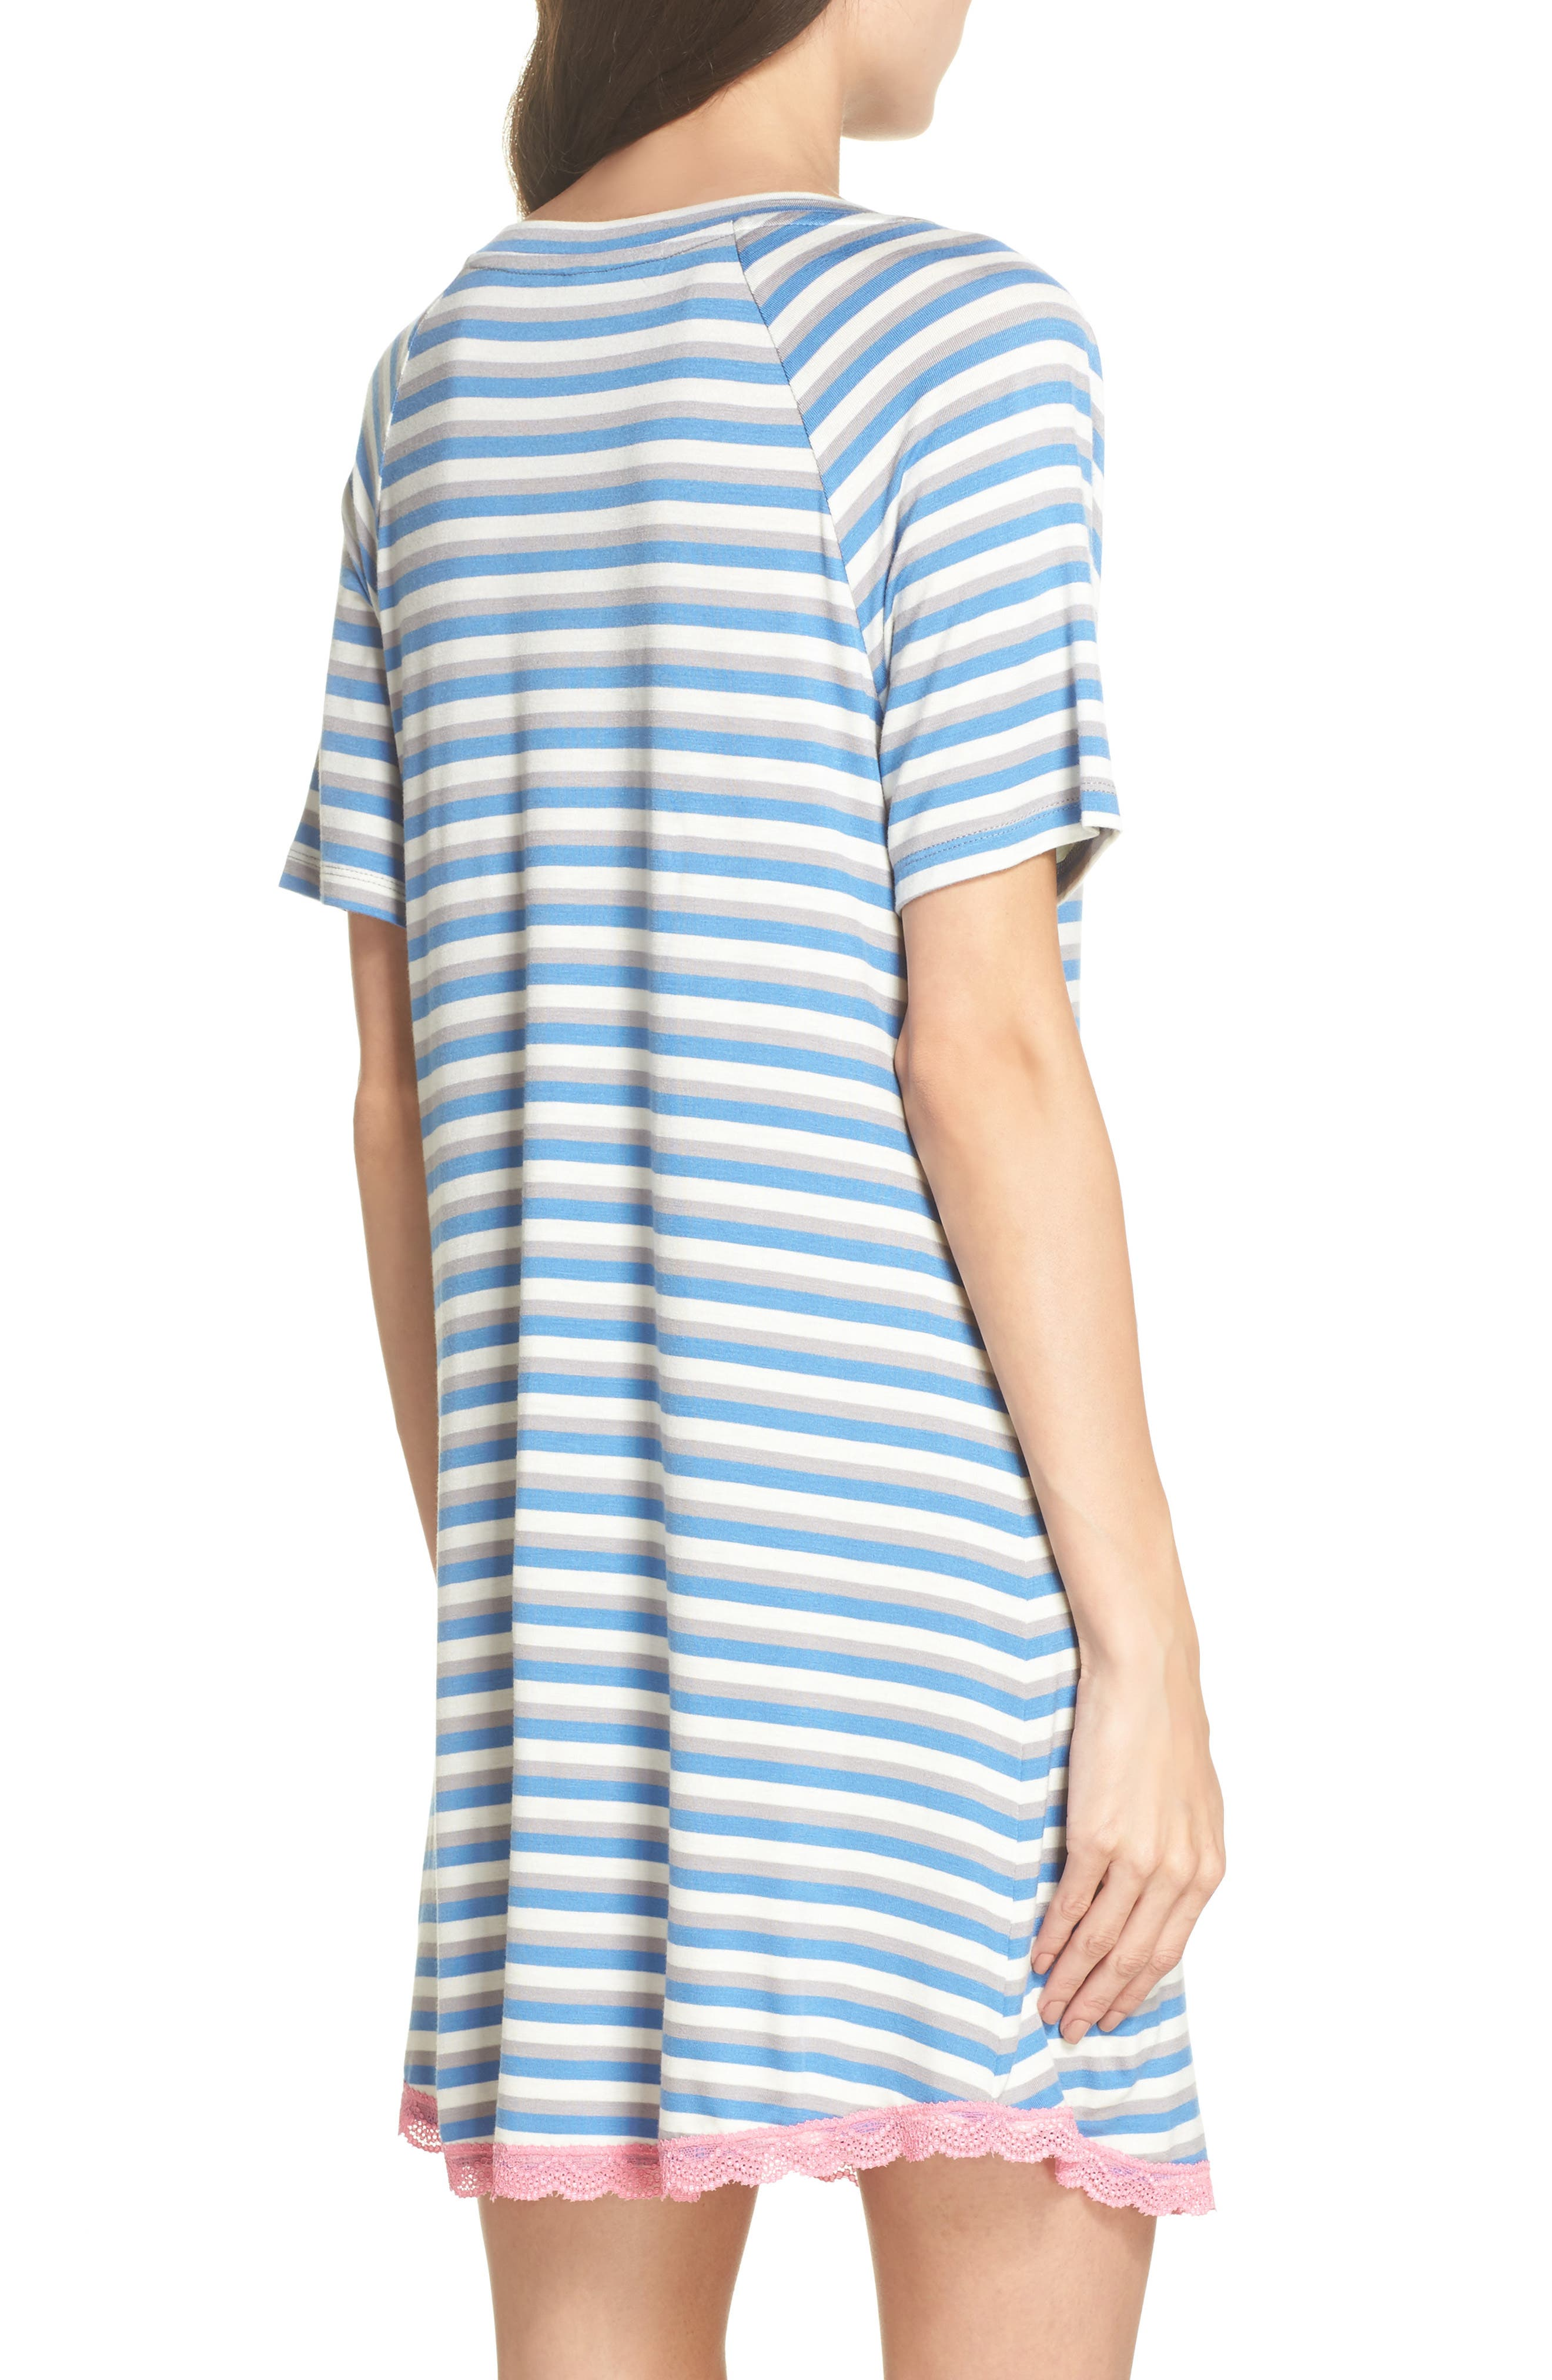 Alternate Image 2  - Honeydew Lace Trim Sleep Shirt (2 for $60)